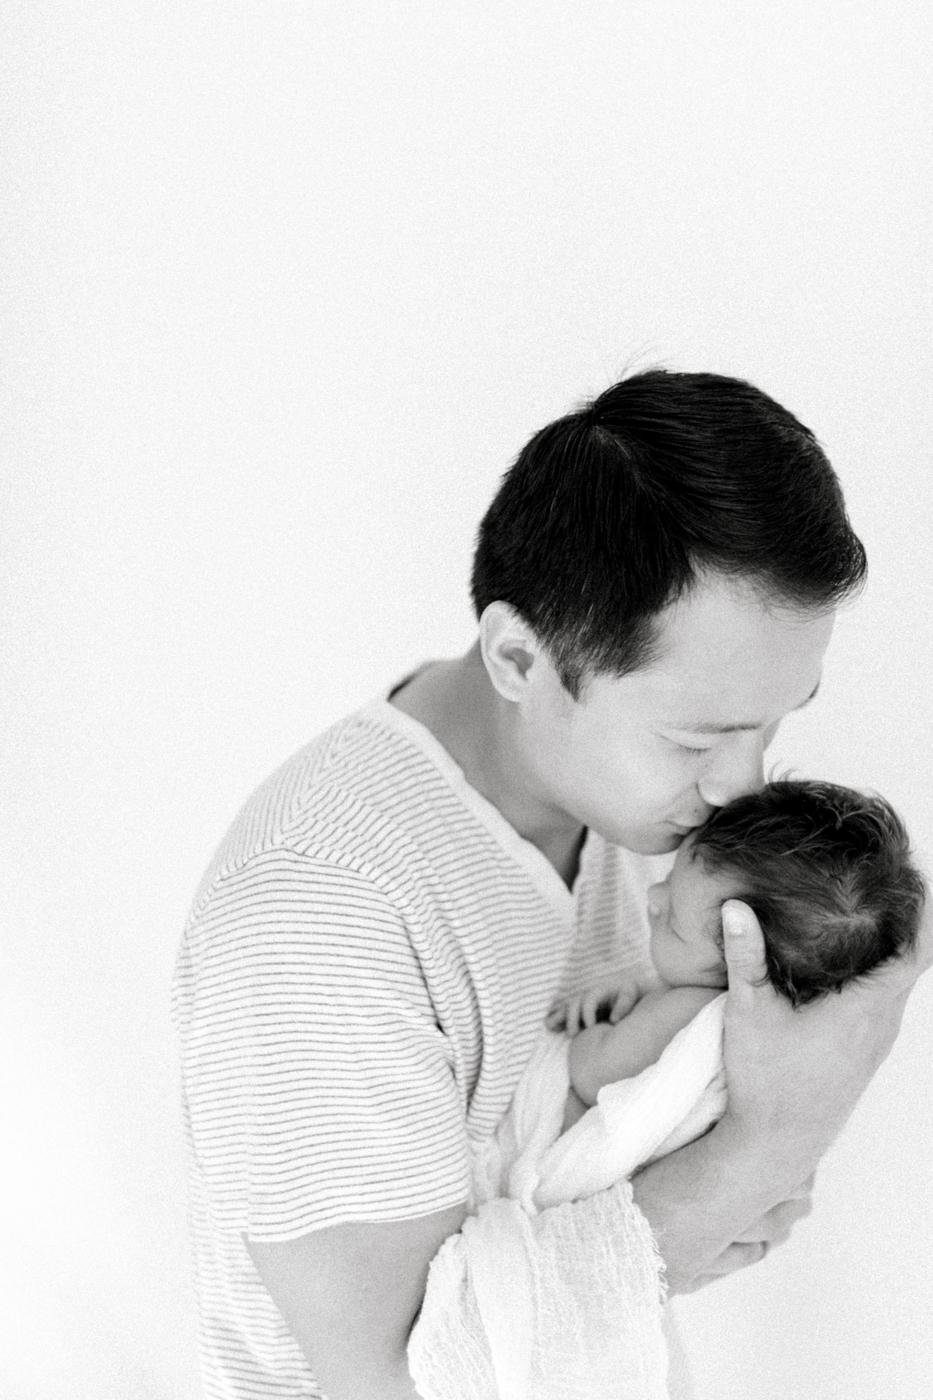 four corners photography atlanta maternity photographer atlanta newborn photographer best atlanta newborn photographer newborn session in home lifestyle newborn session-21.jpg